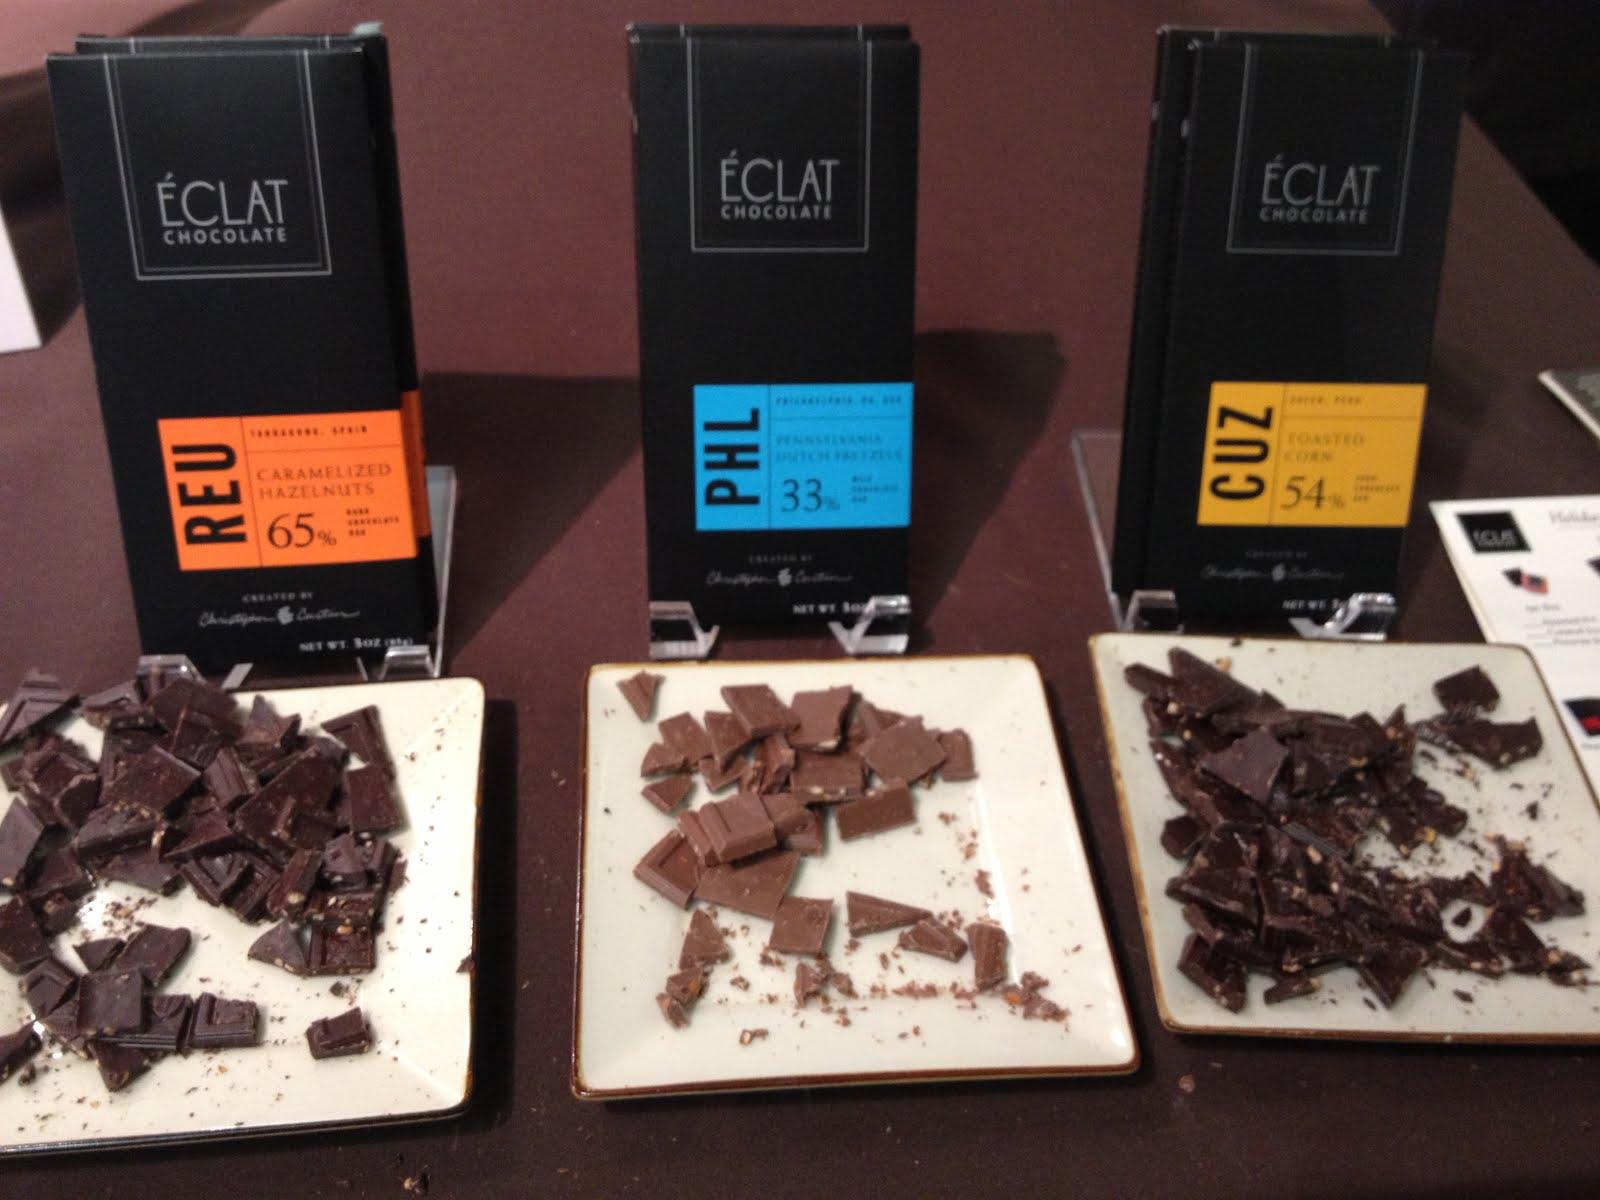 Chocolate NYC: The Chocolate Show: Recap #4